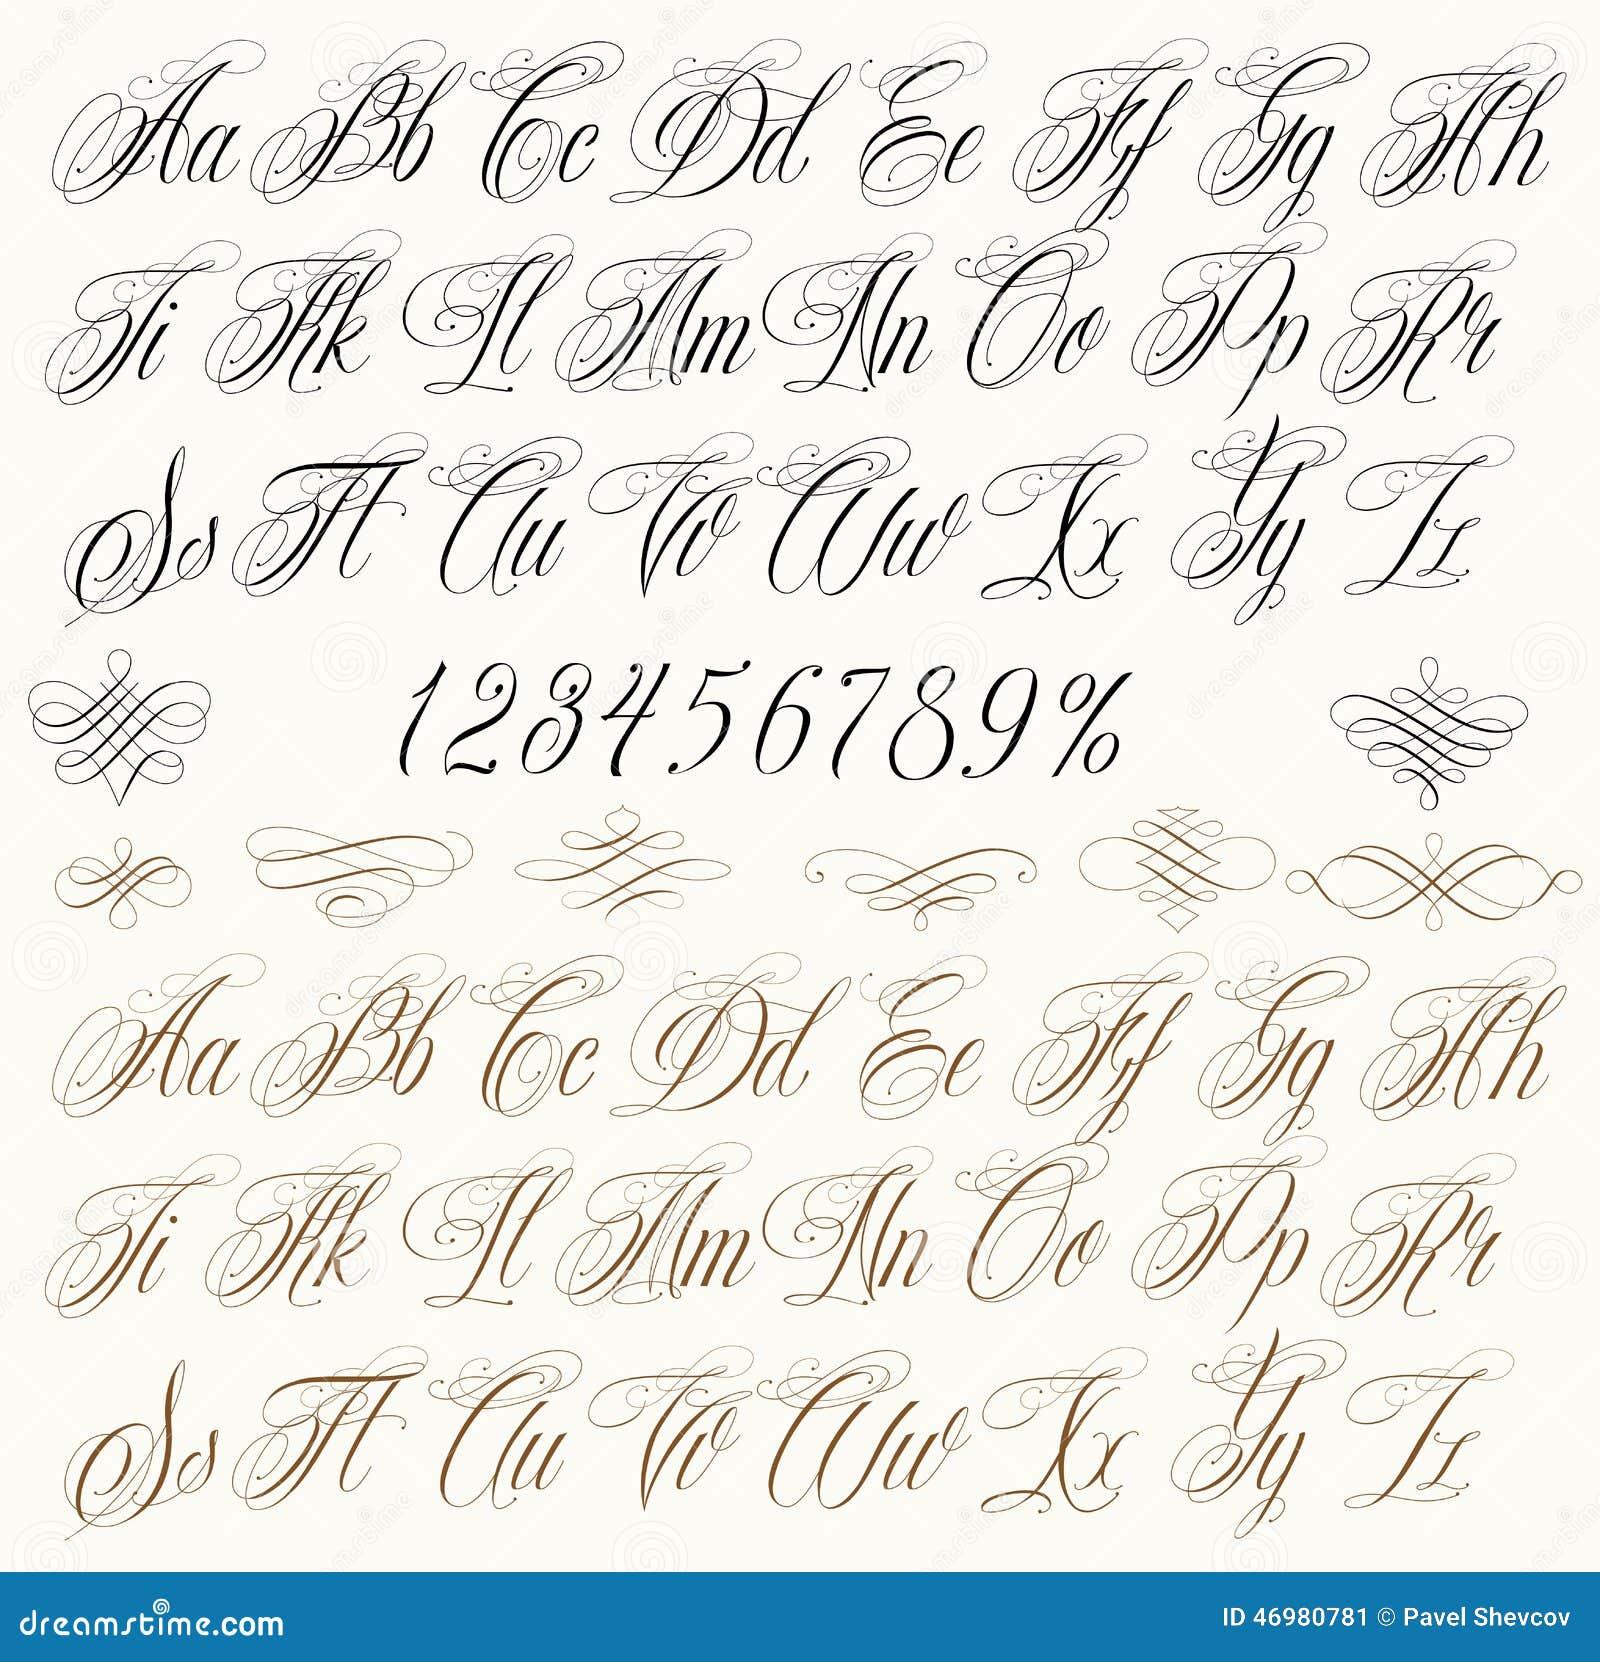 Letras Da Tatuagem Ilustracao Do Vetor Ilustracao De Handwritten